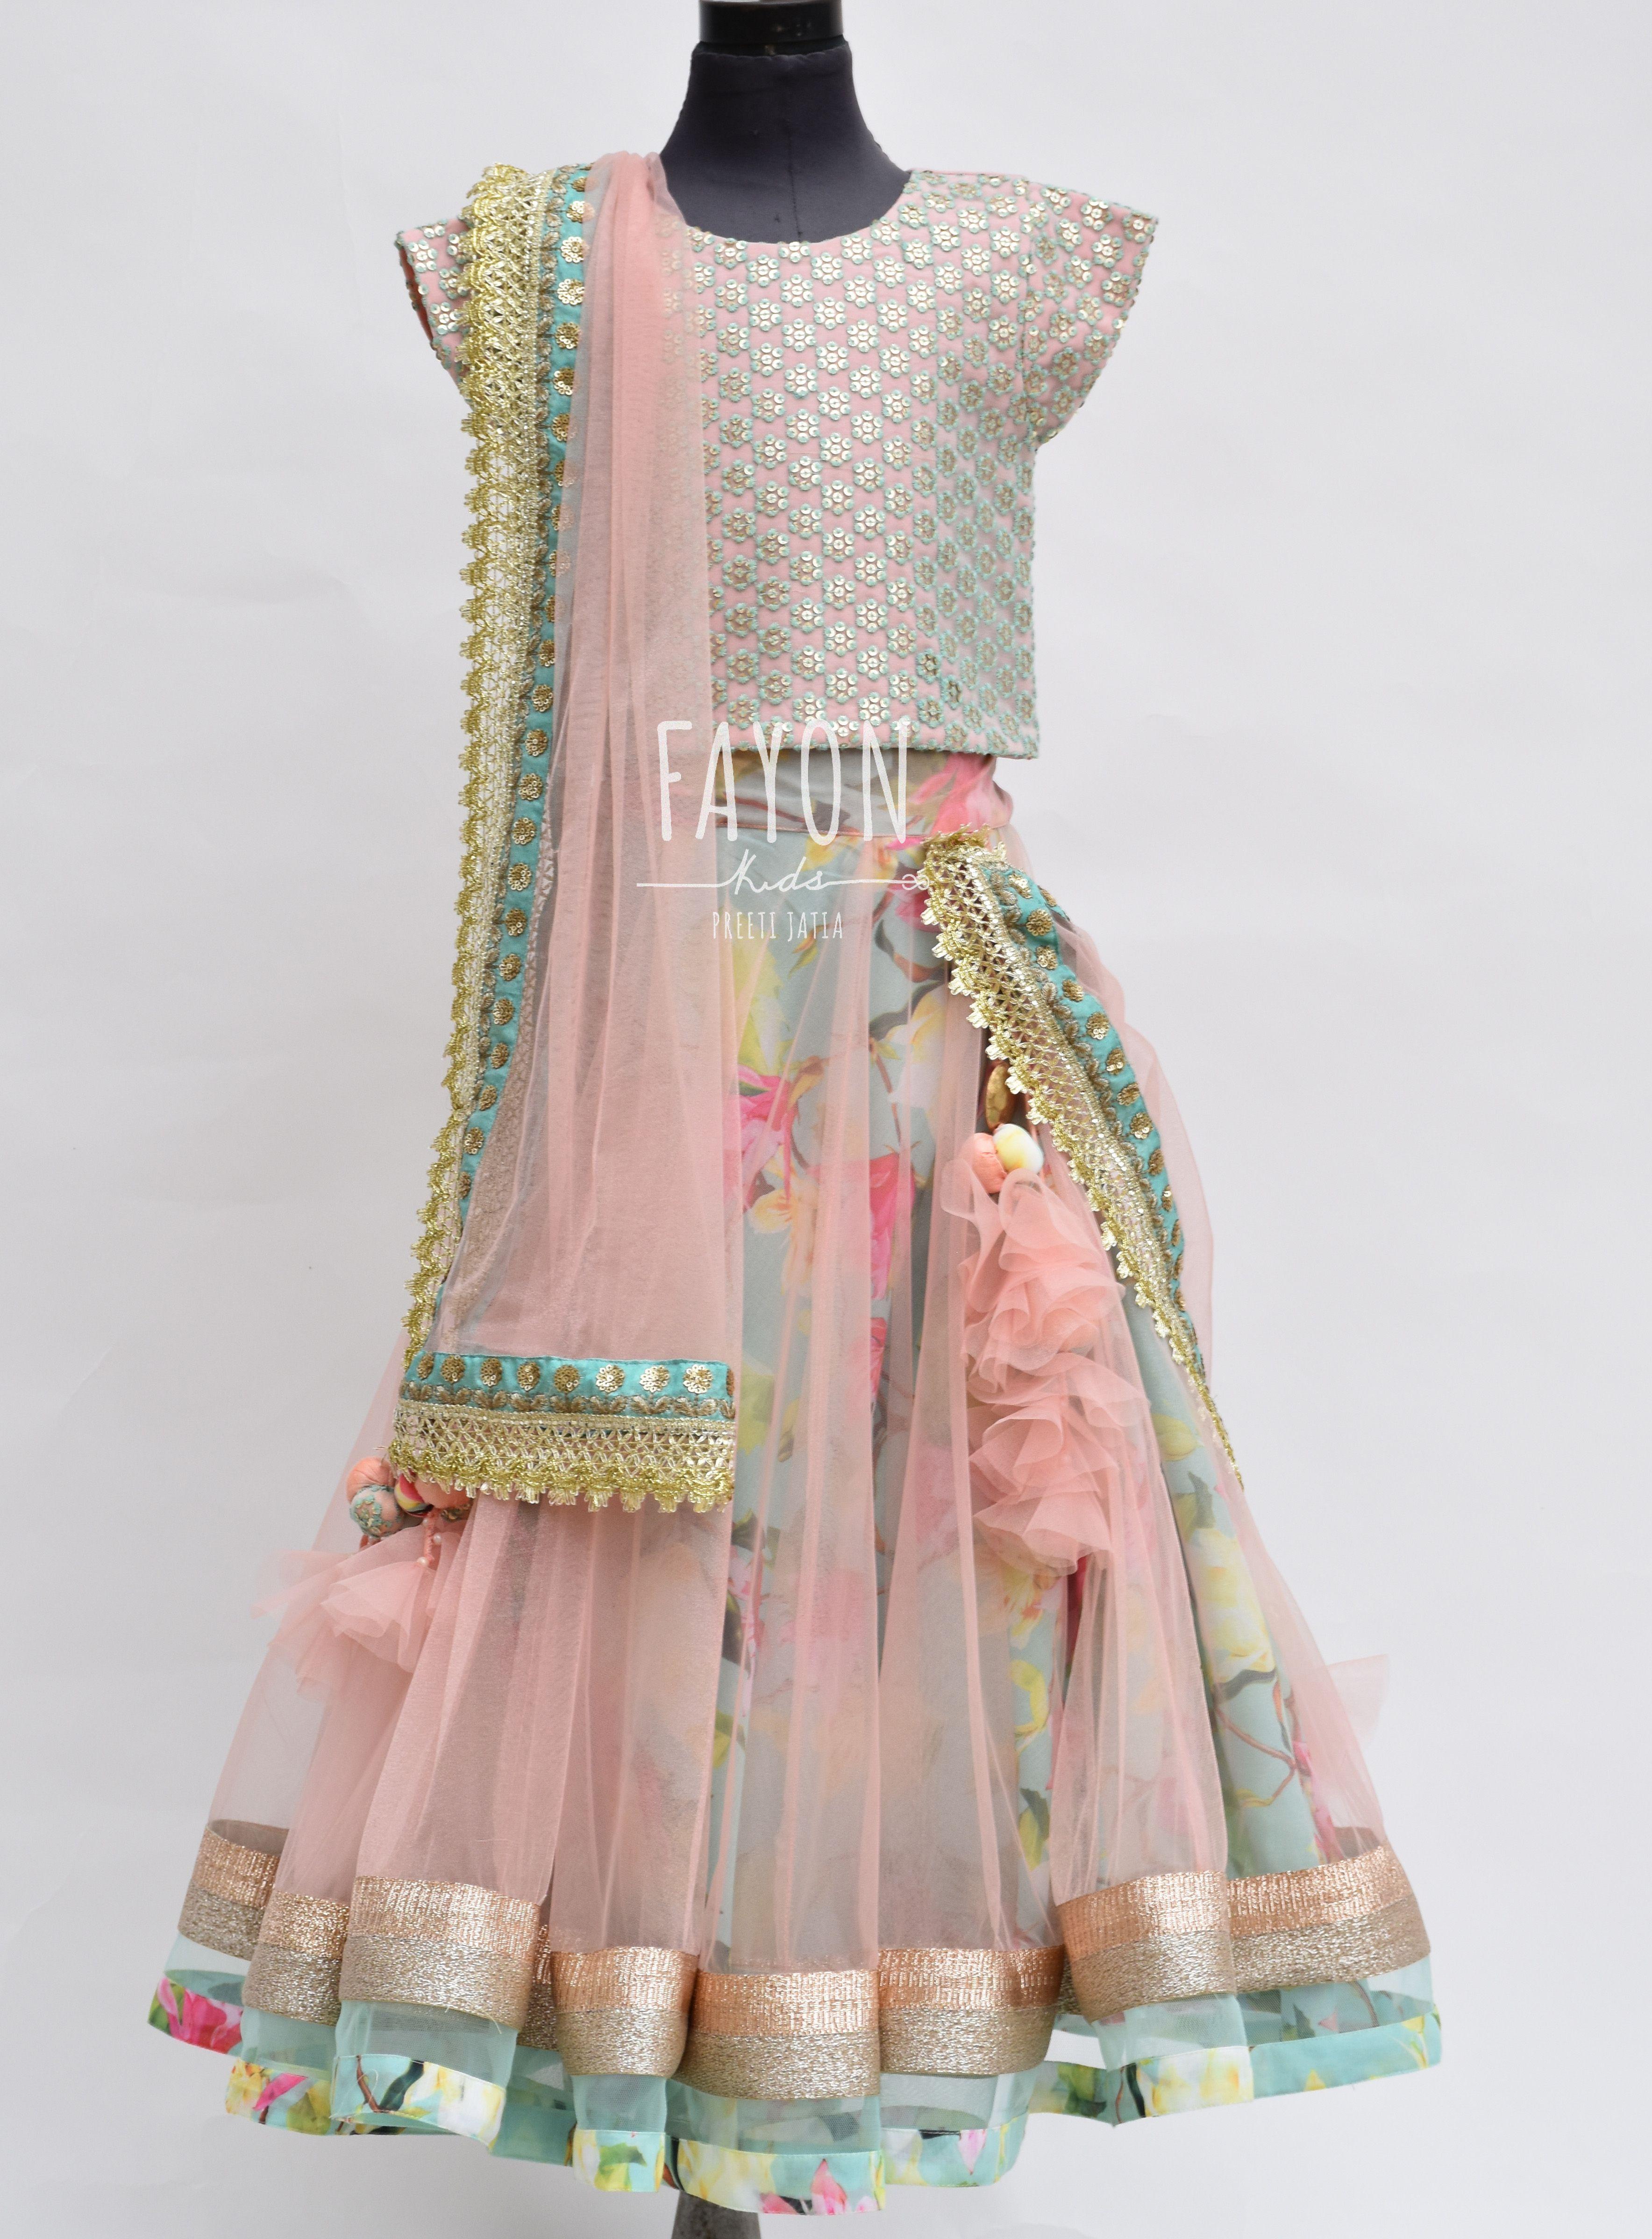 Buy exclusive premium Indian designer wear for kids babies and